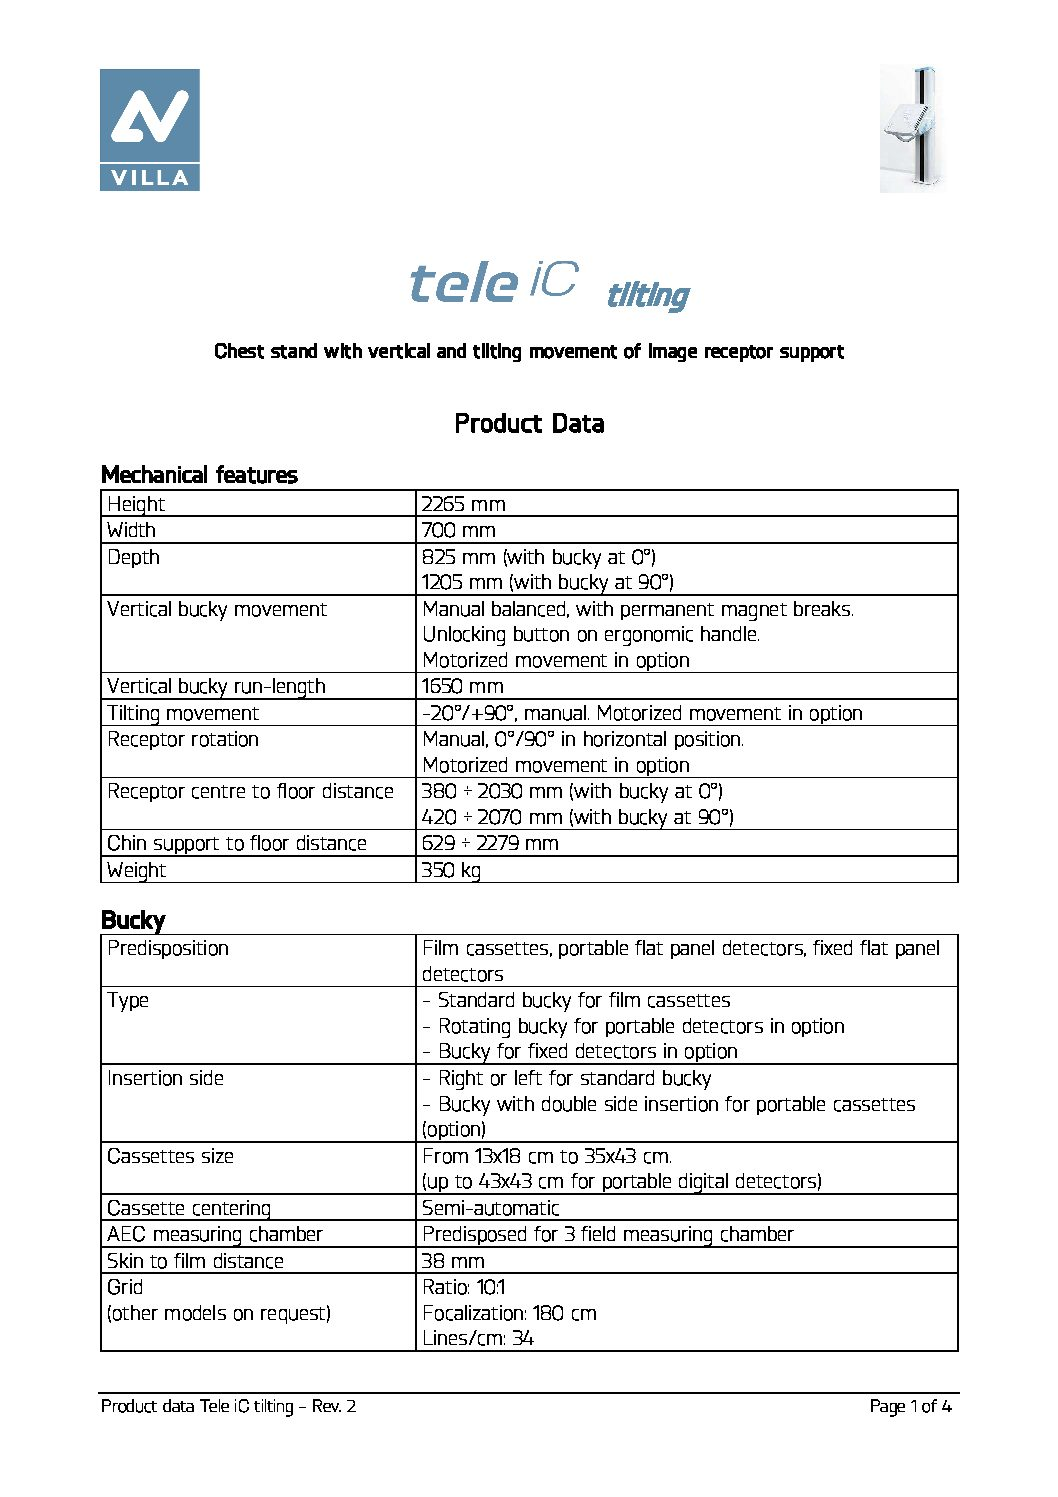 Moviplan Tele iC tilting product data en